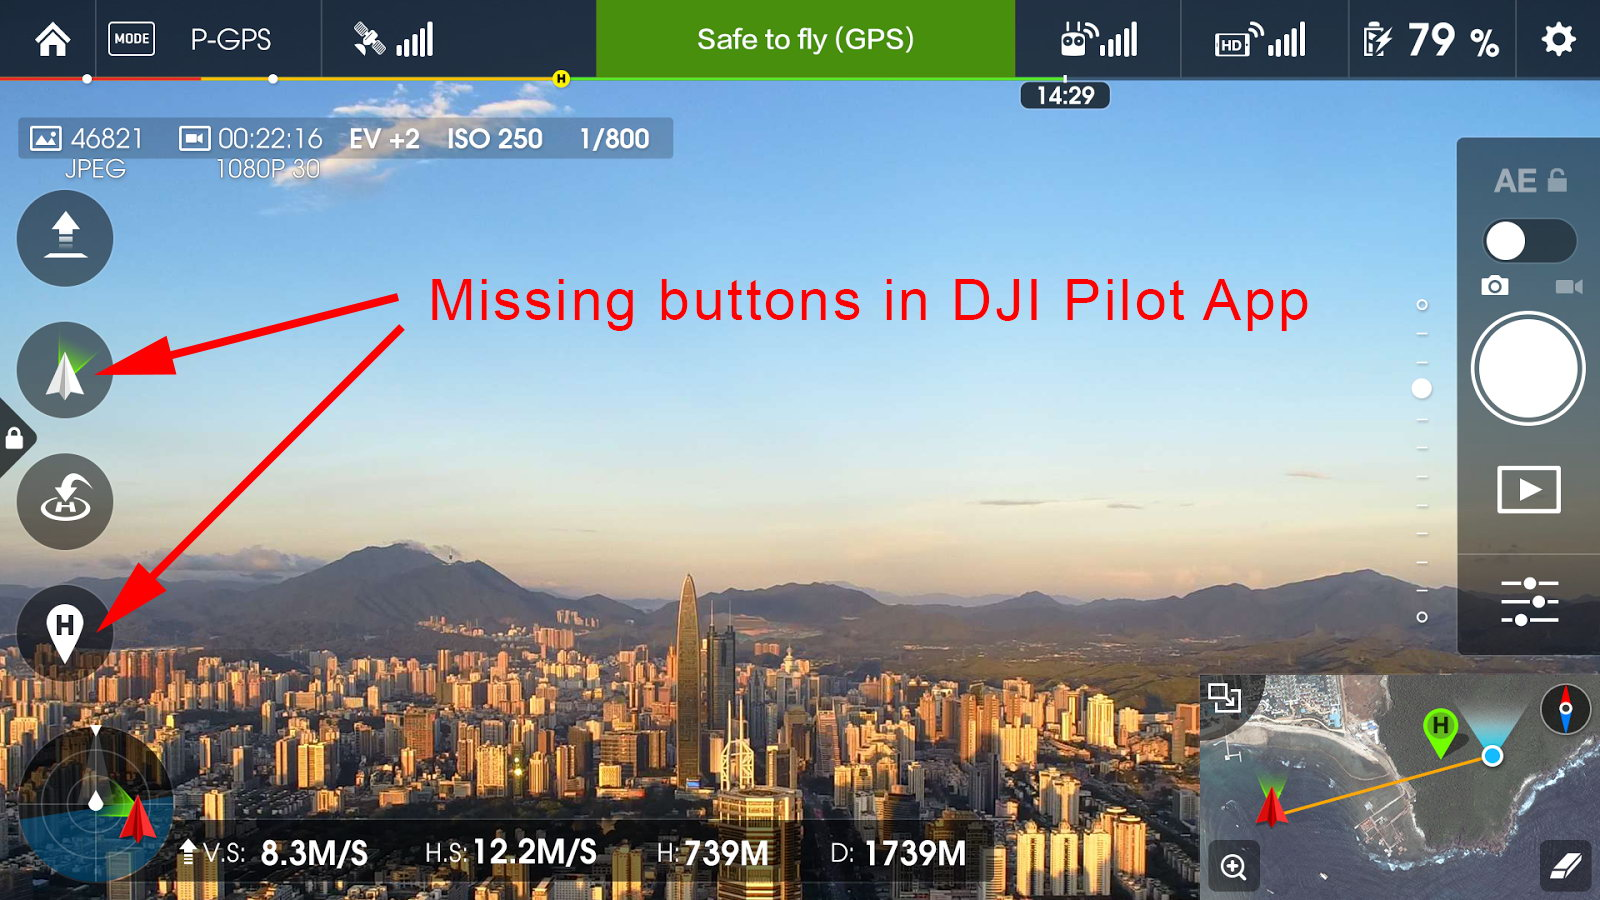 dji 4 pro firmware update from phone app